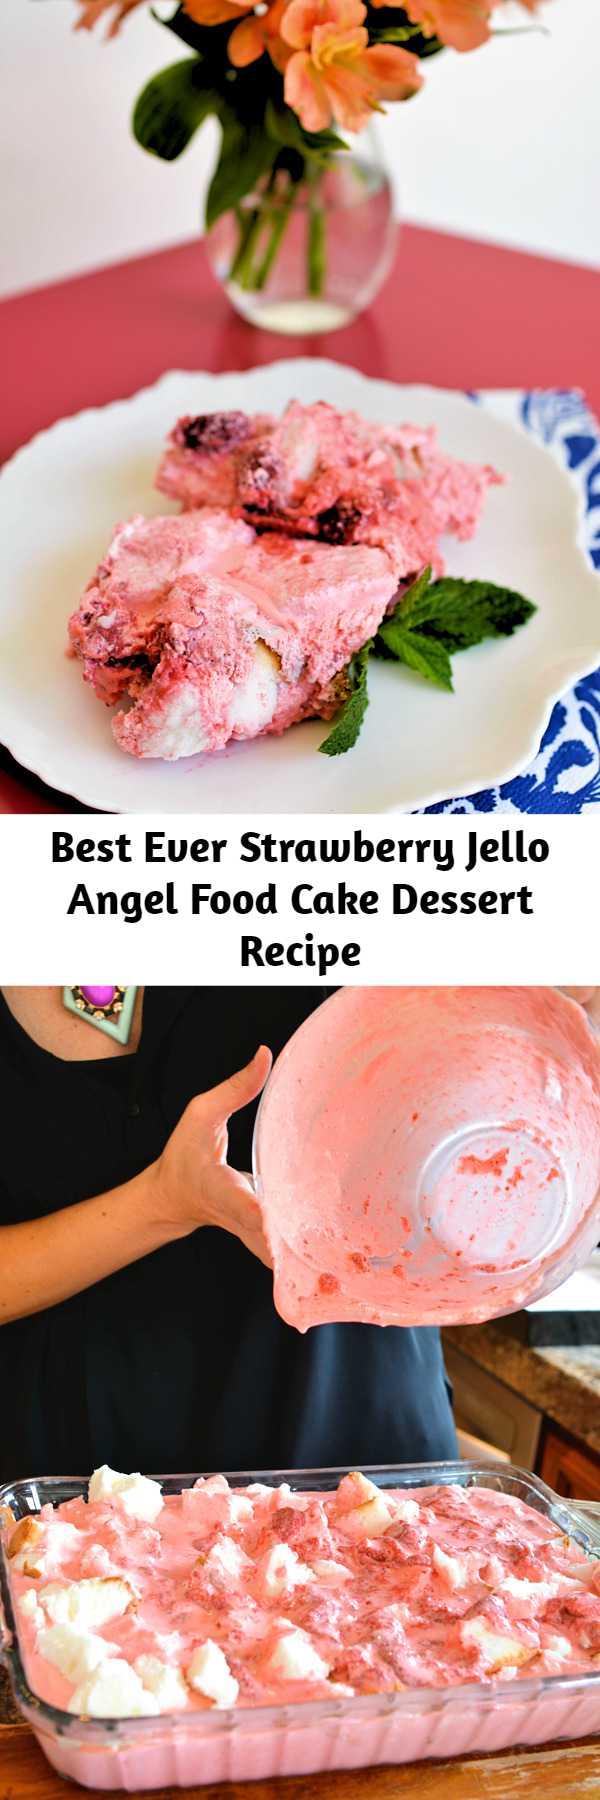 Best Ever Strawberry Jello Angel Food Cake Dessert Recipe